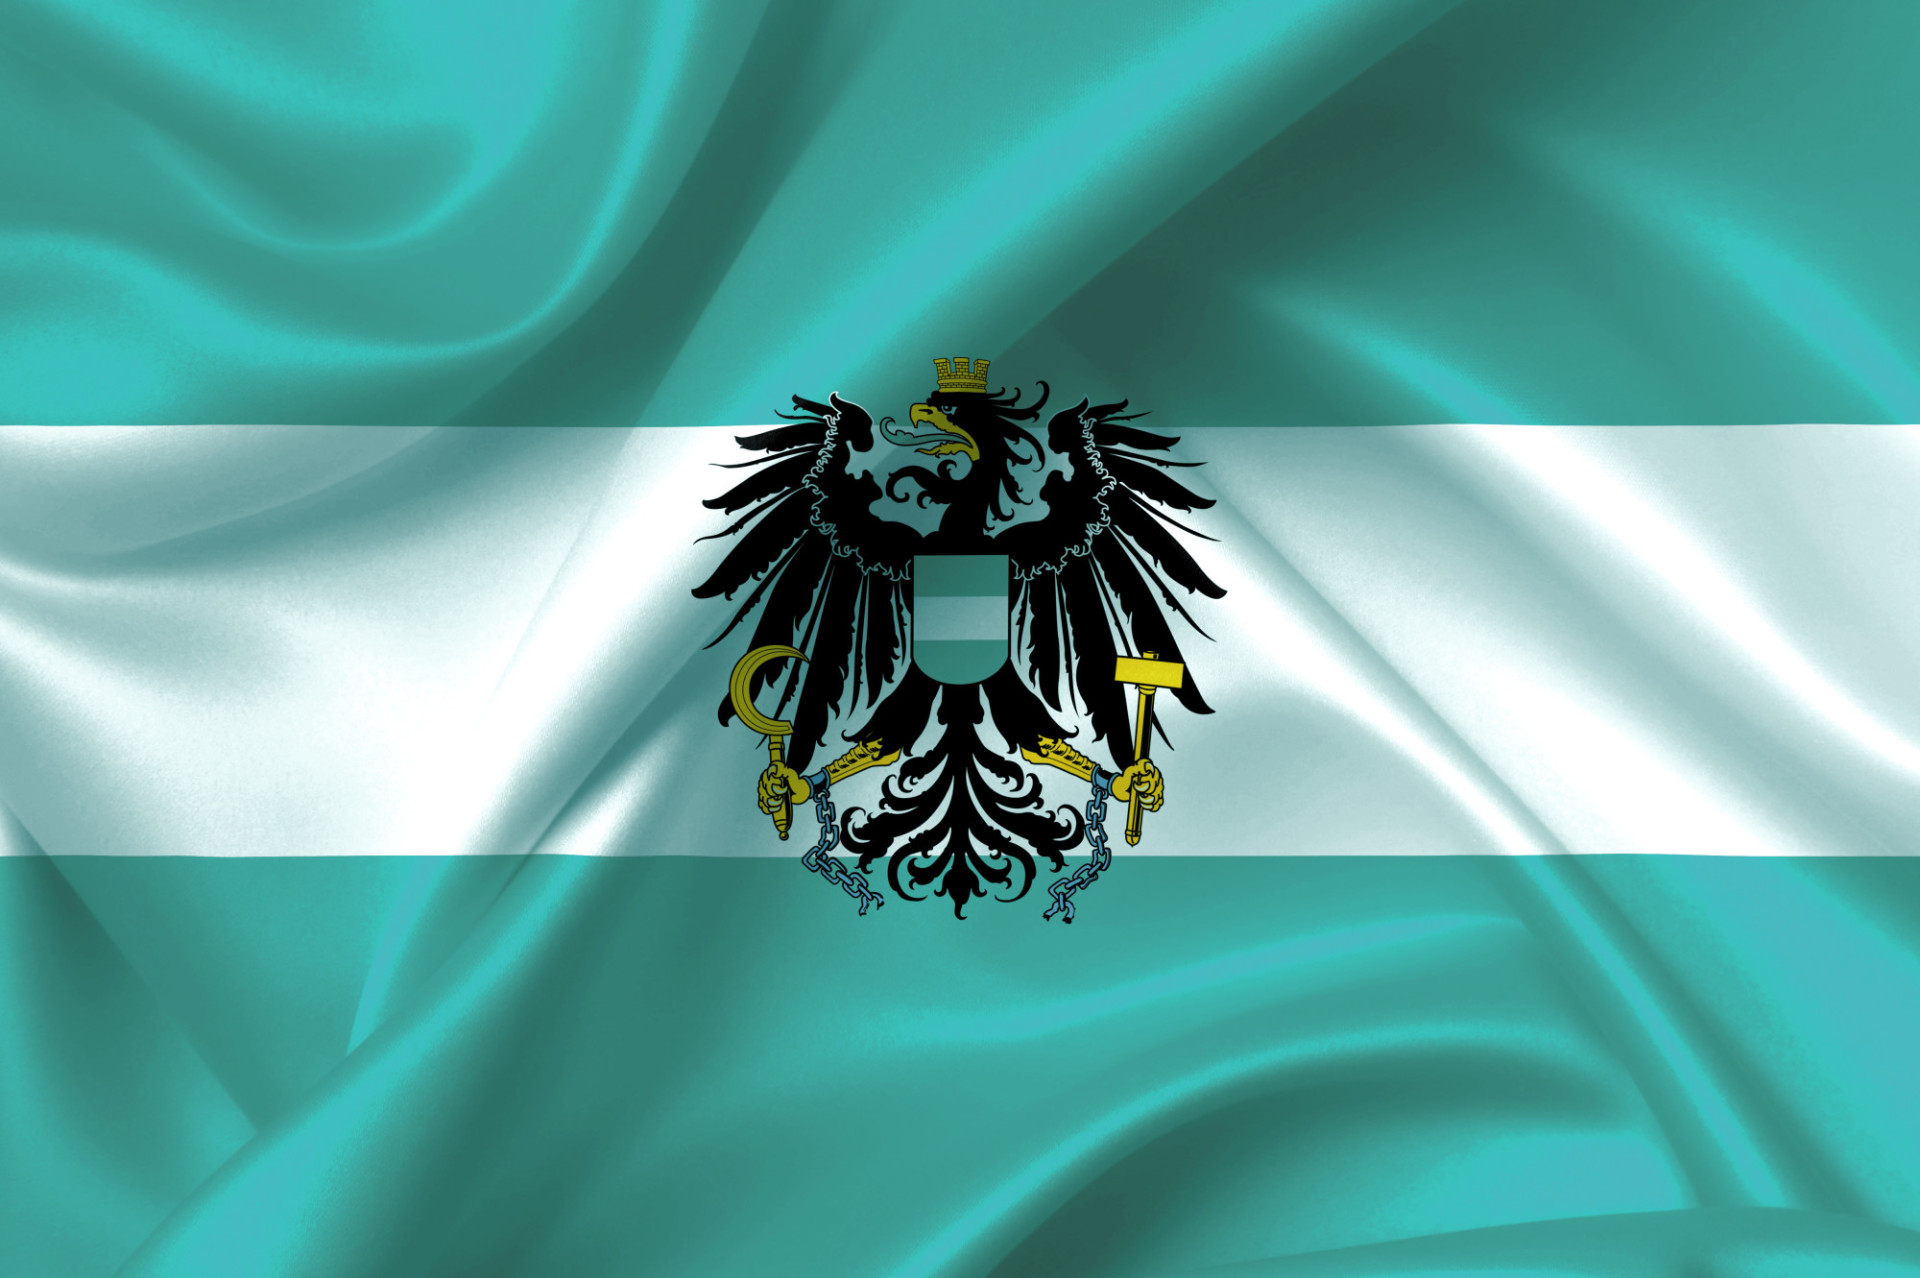 Turquoise Austria flag crisis